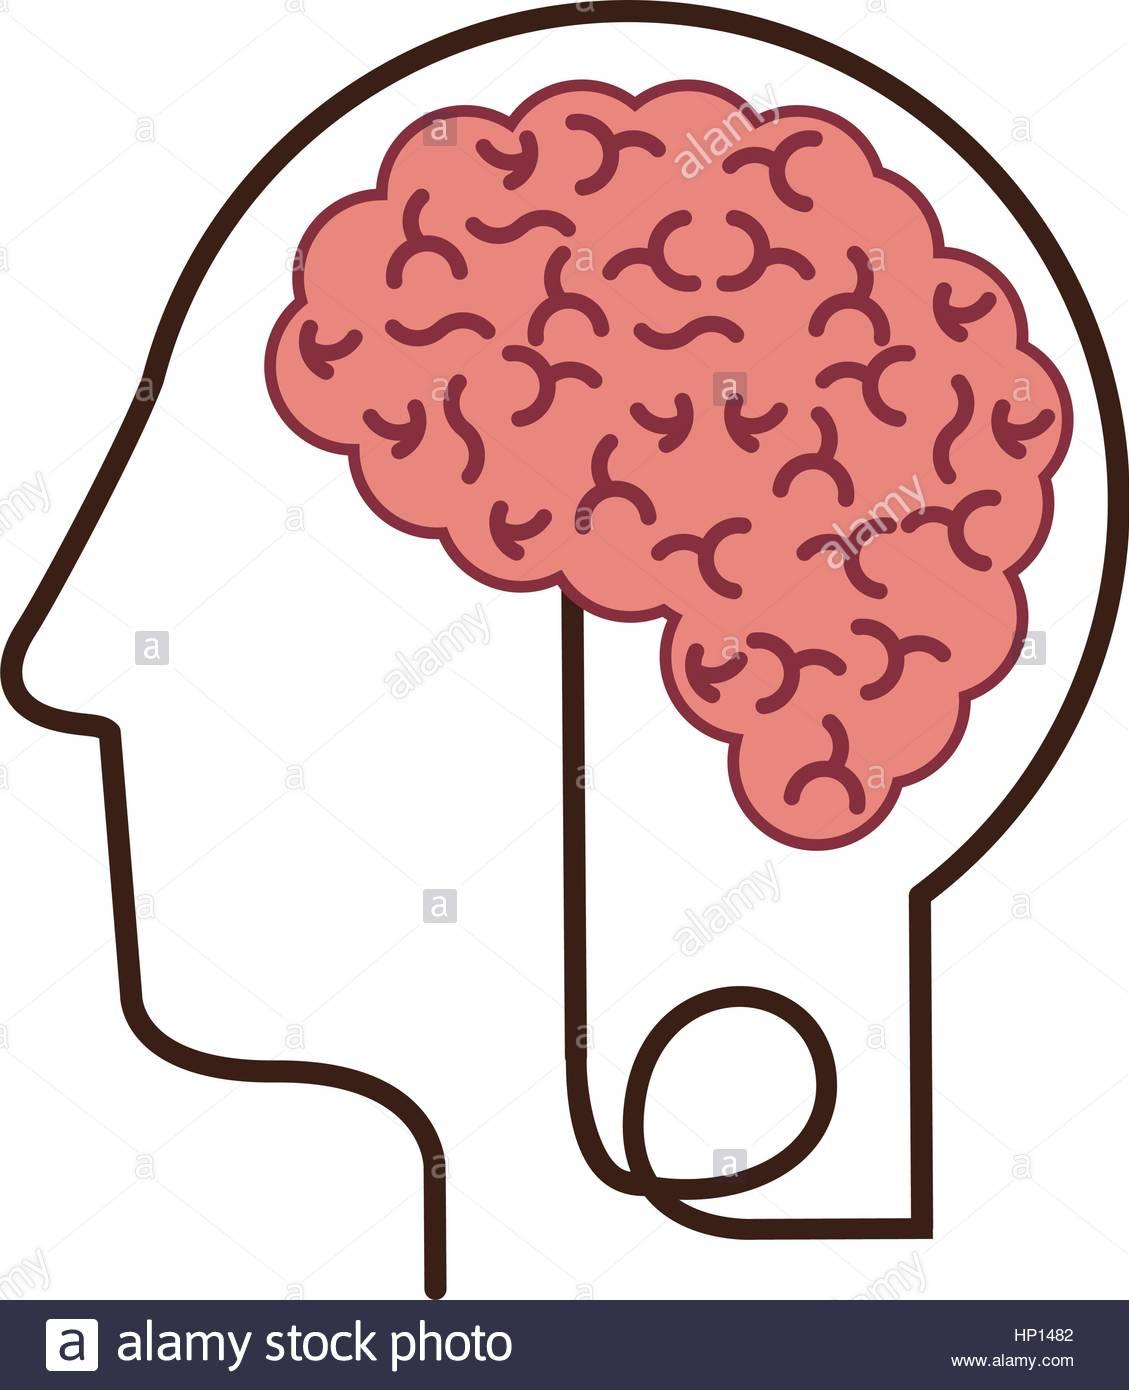 1129x1390 Silhouette Profile Human Head With Brain Vector Illustration Stock